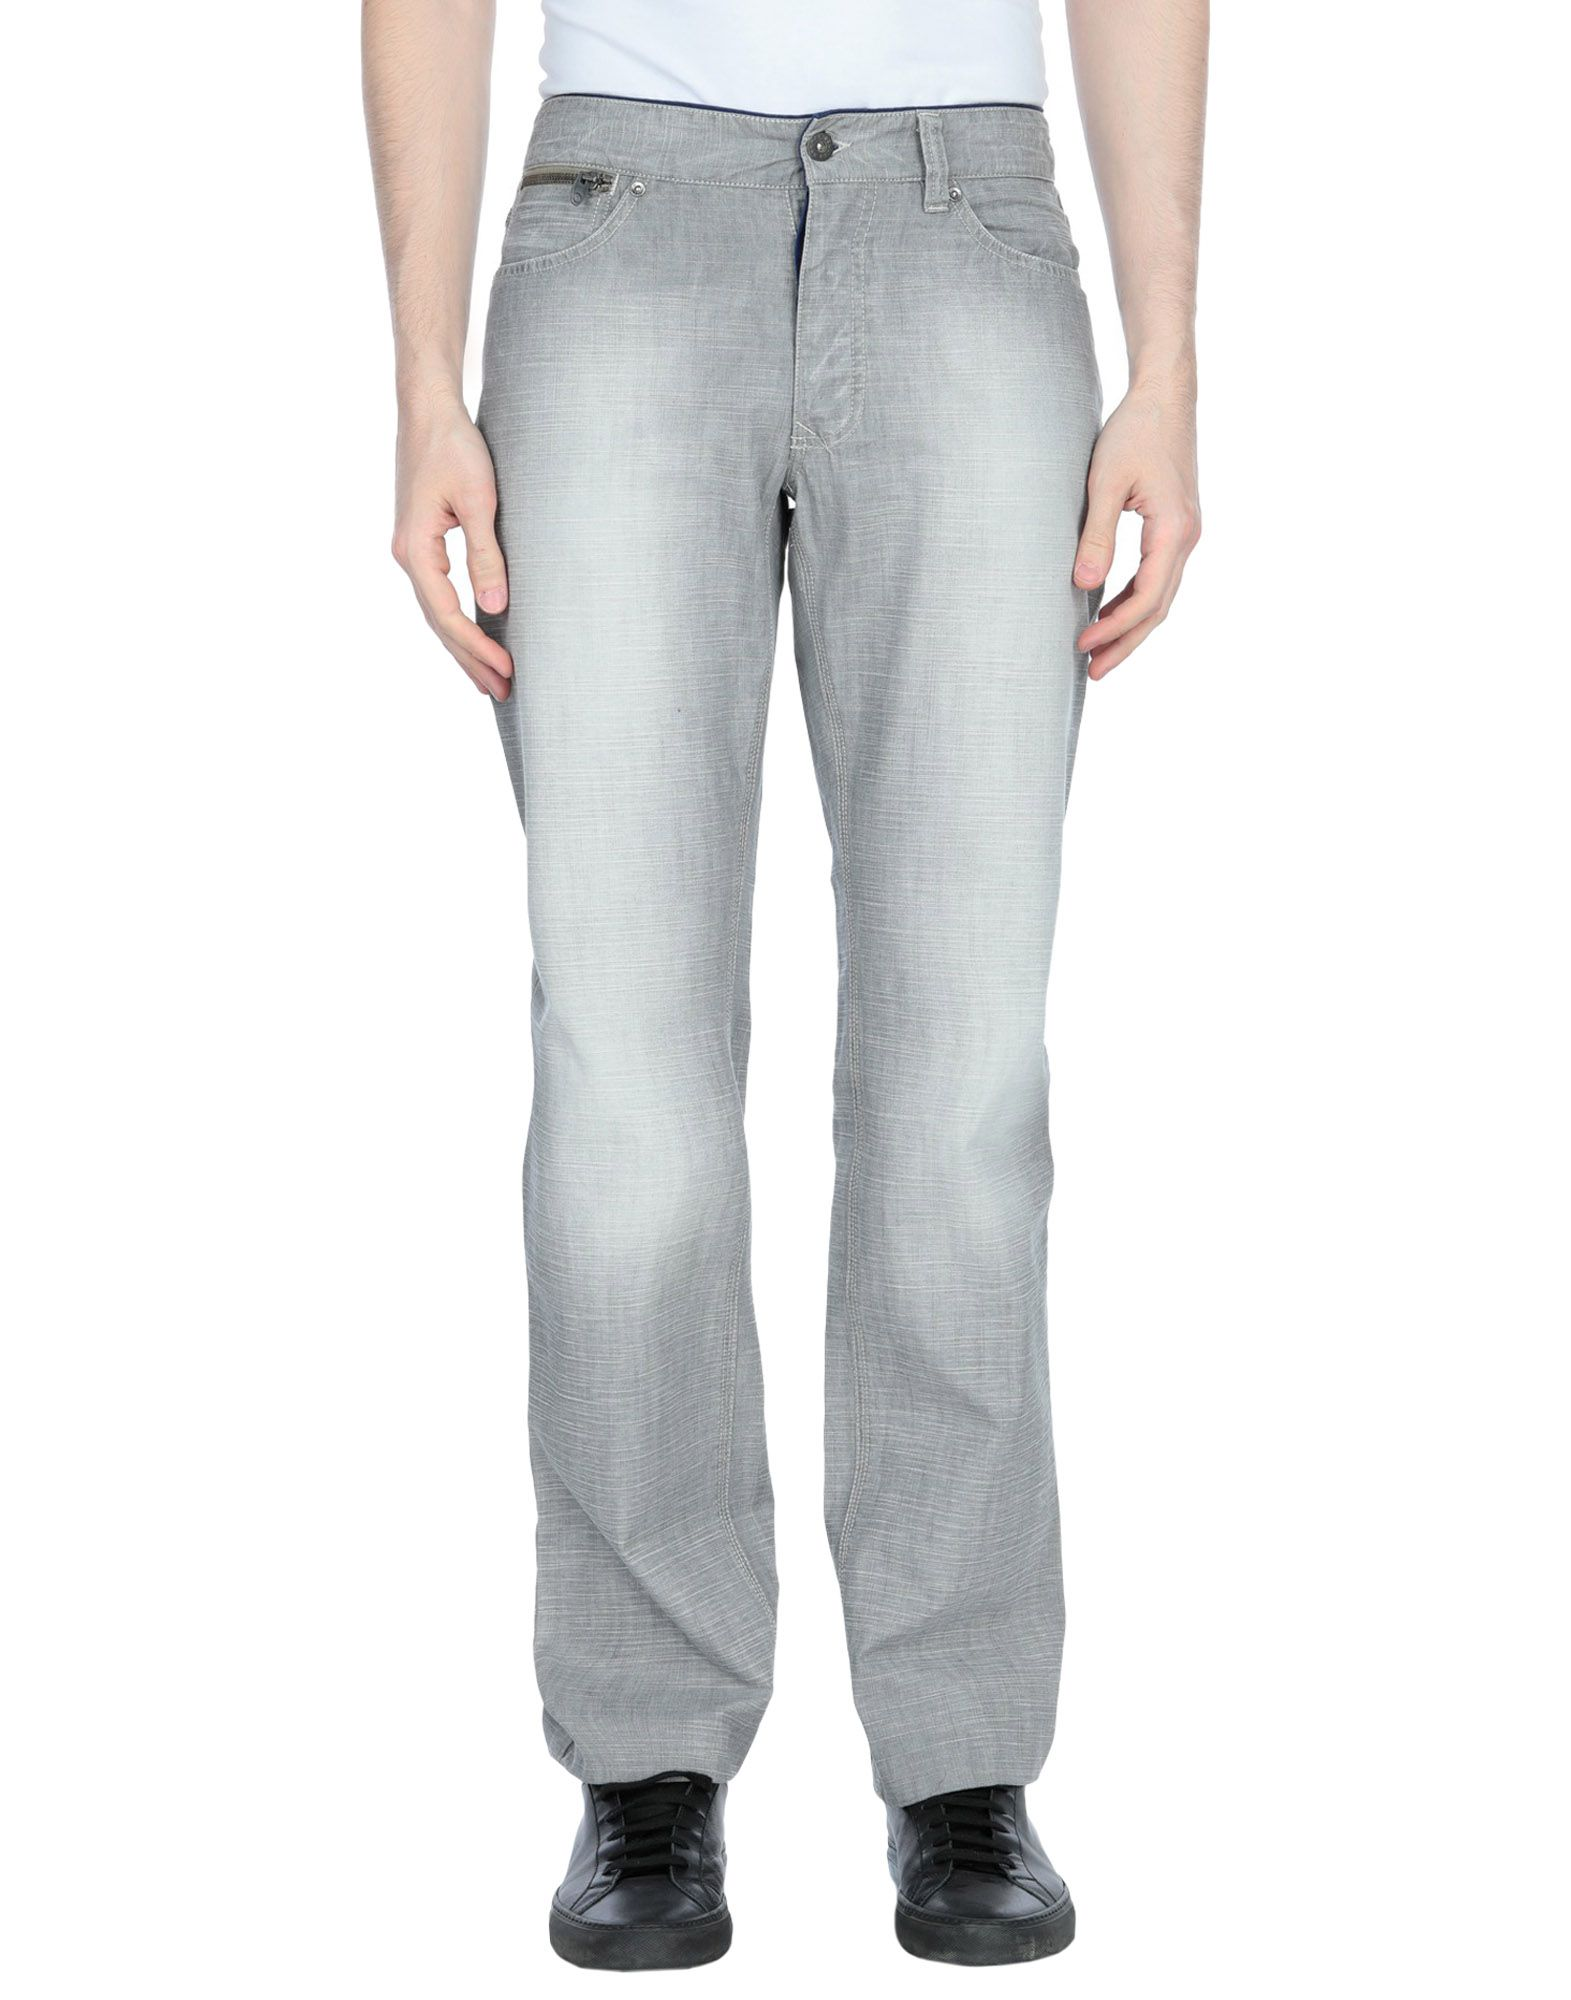 Pantaloni Jeans Dekker uomo - 42727250GA 42727250GA  wird dich zufrieden stellen